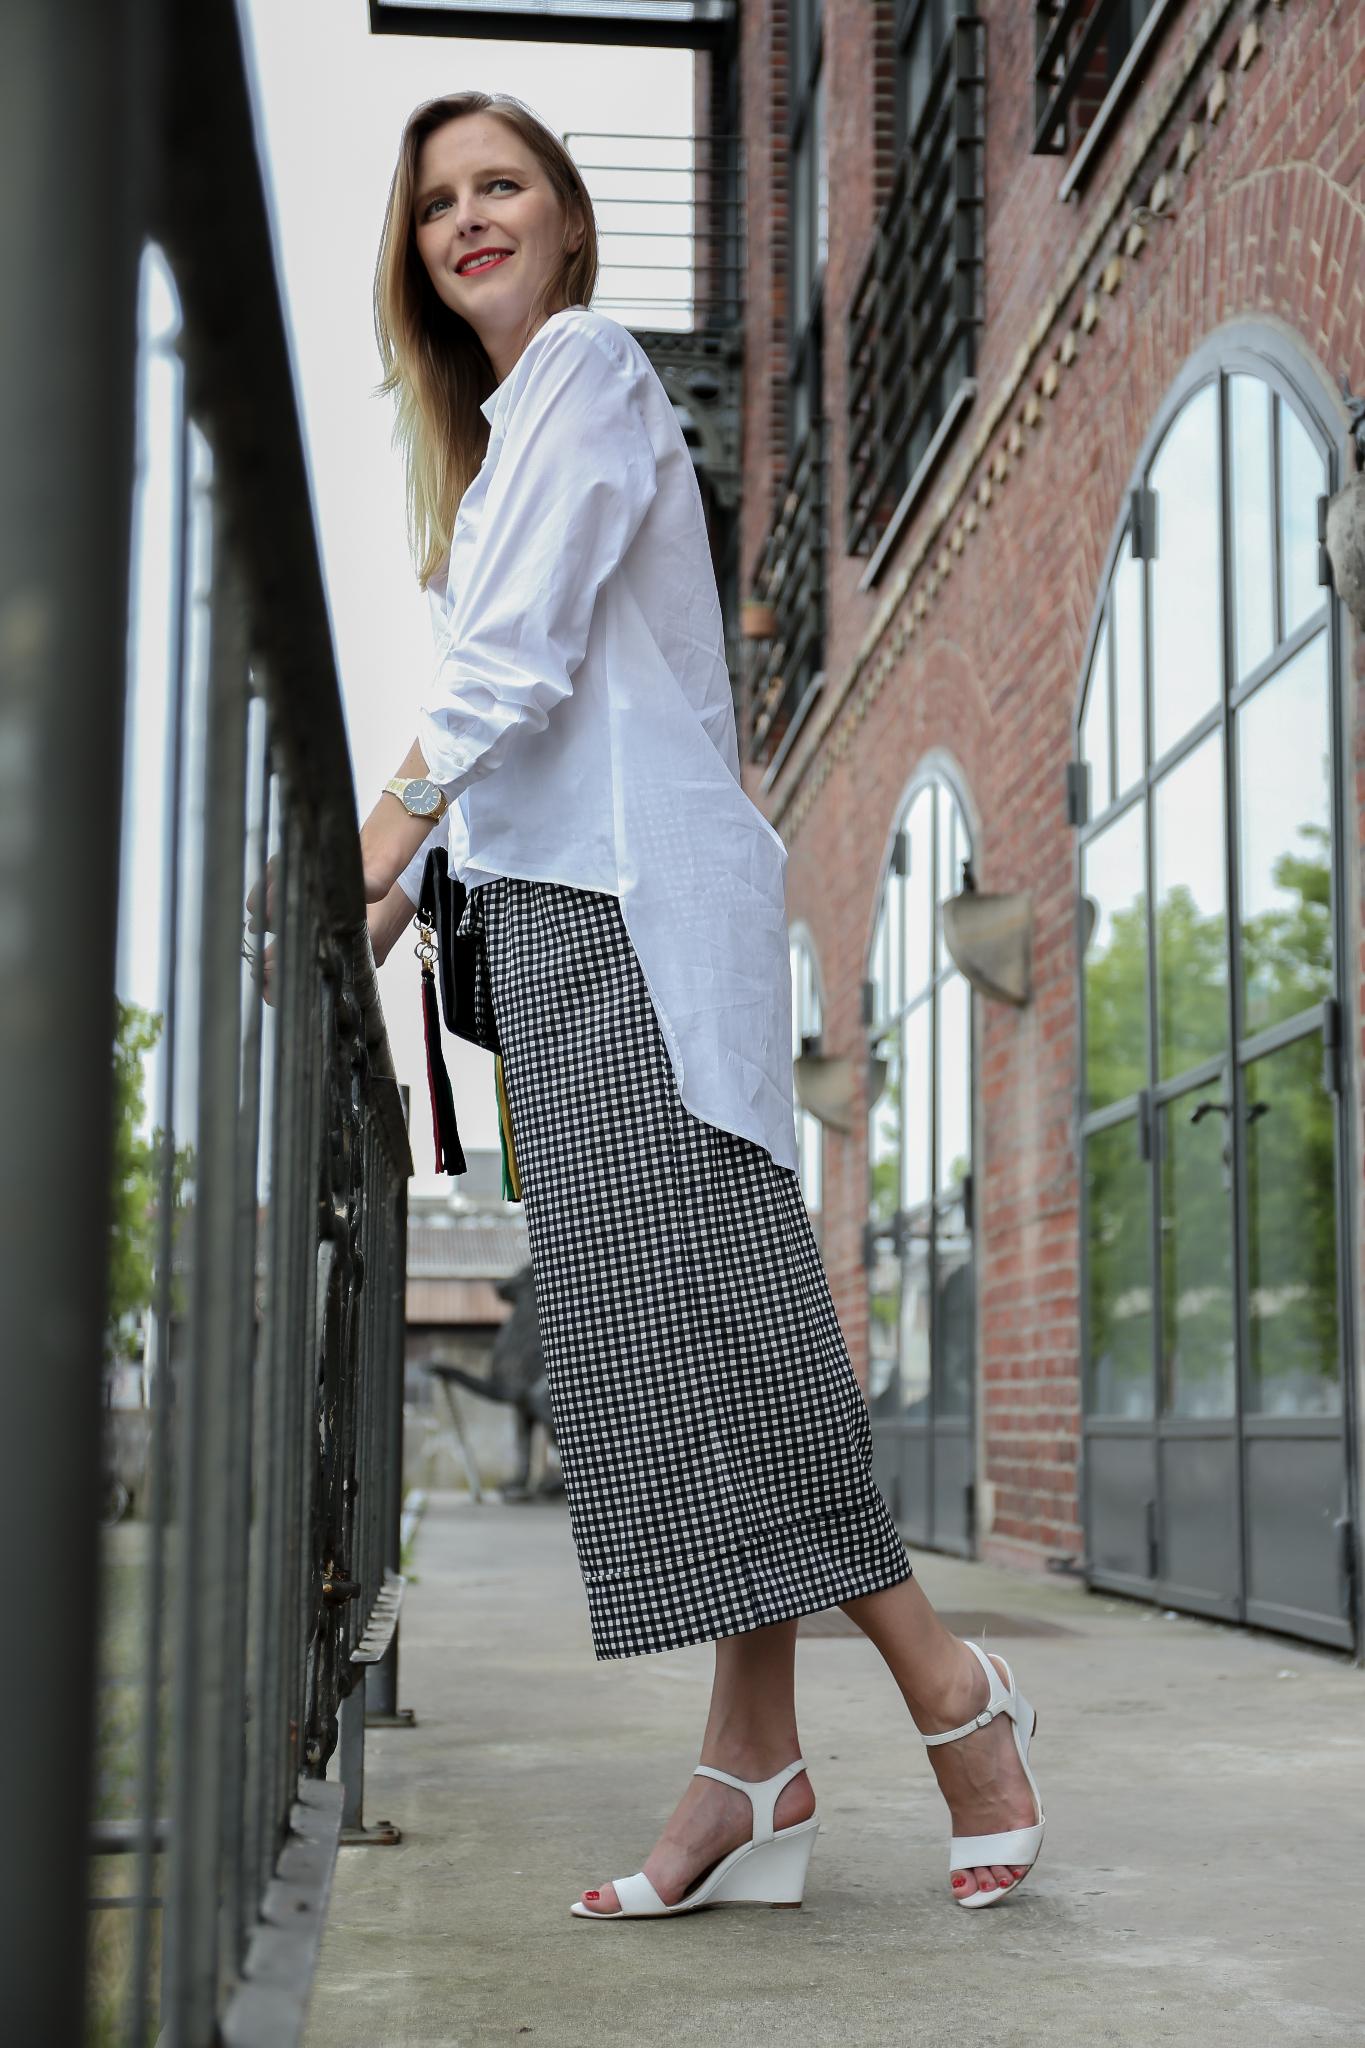 Fashion_Outfit_Chloé_Jane_Vichy_Print_MOD - by Monique-11